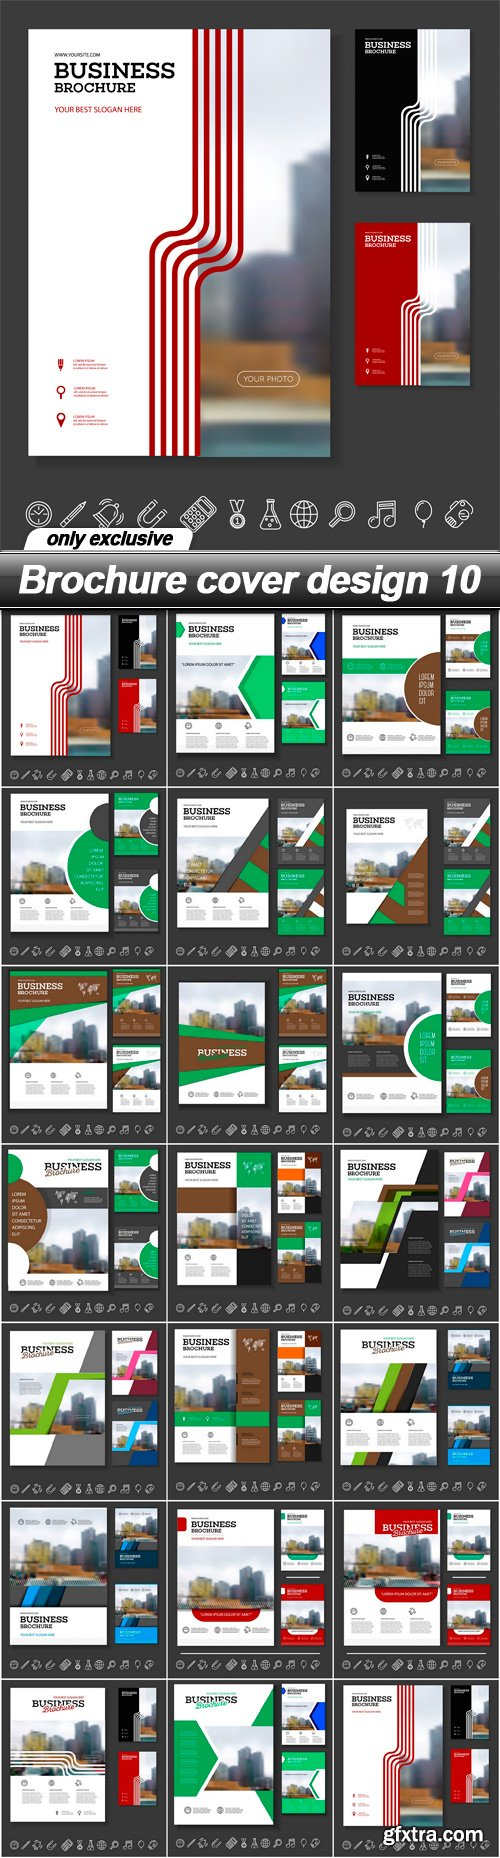 Brochure cover design 10 - 20 EPS